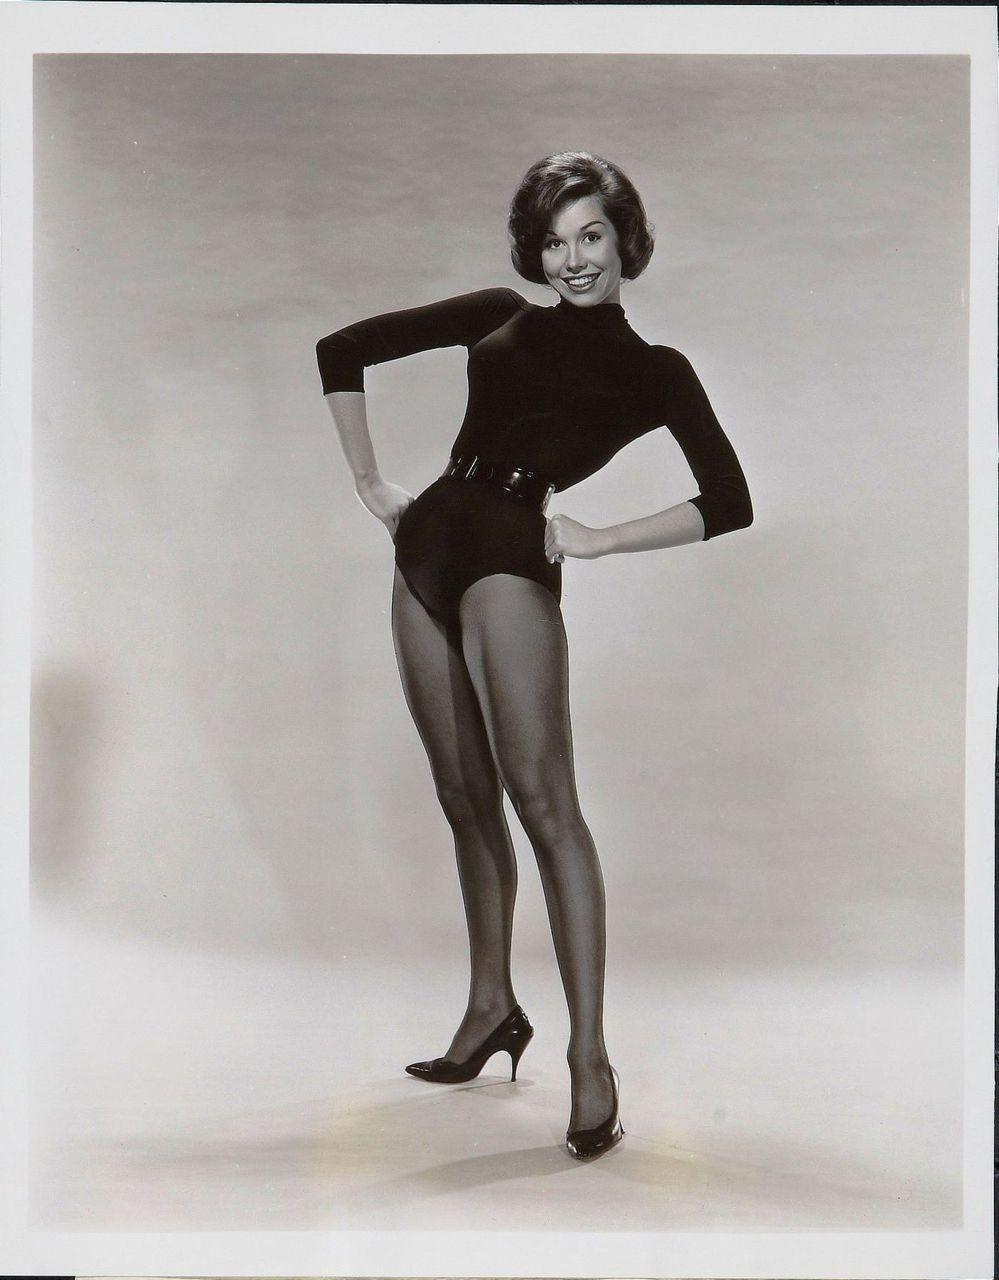 image Julie ann pantyhose leotard snap crotch